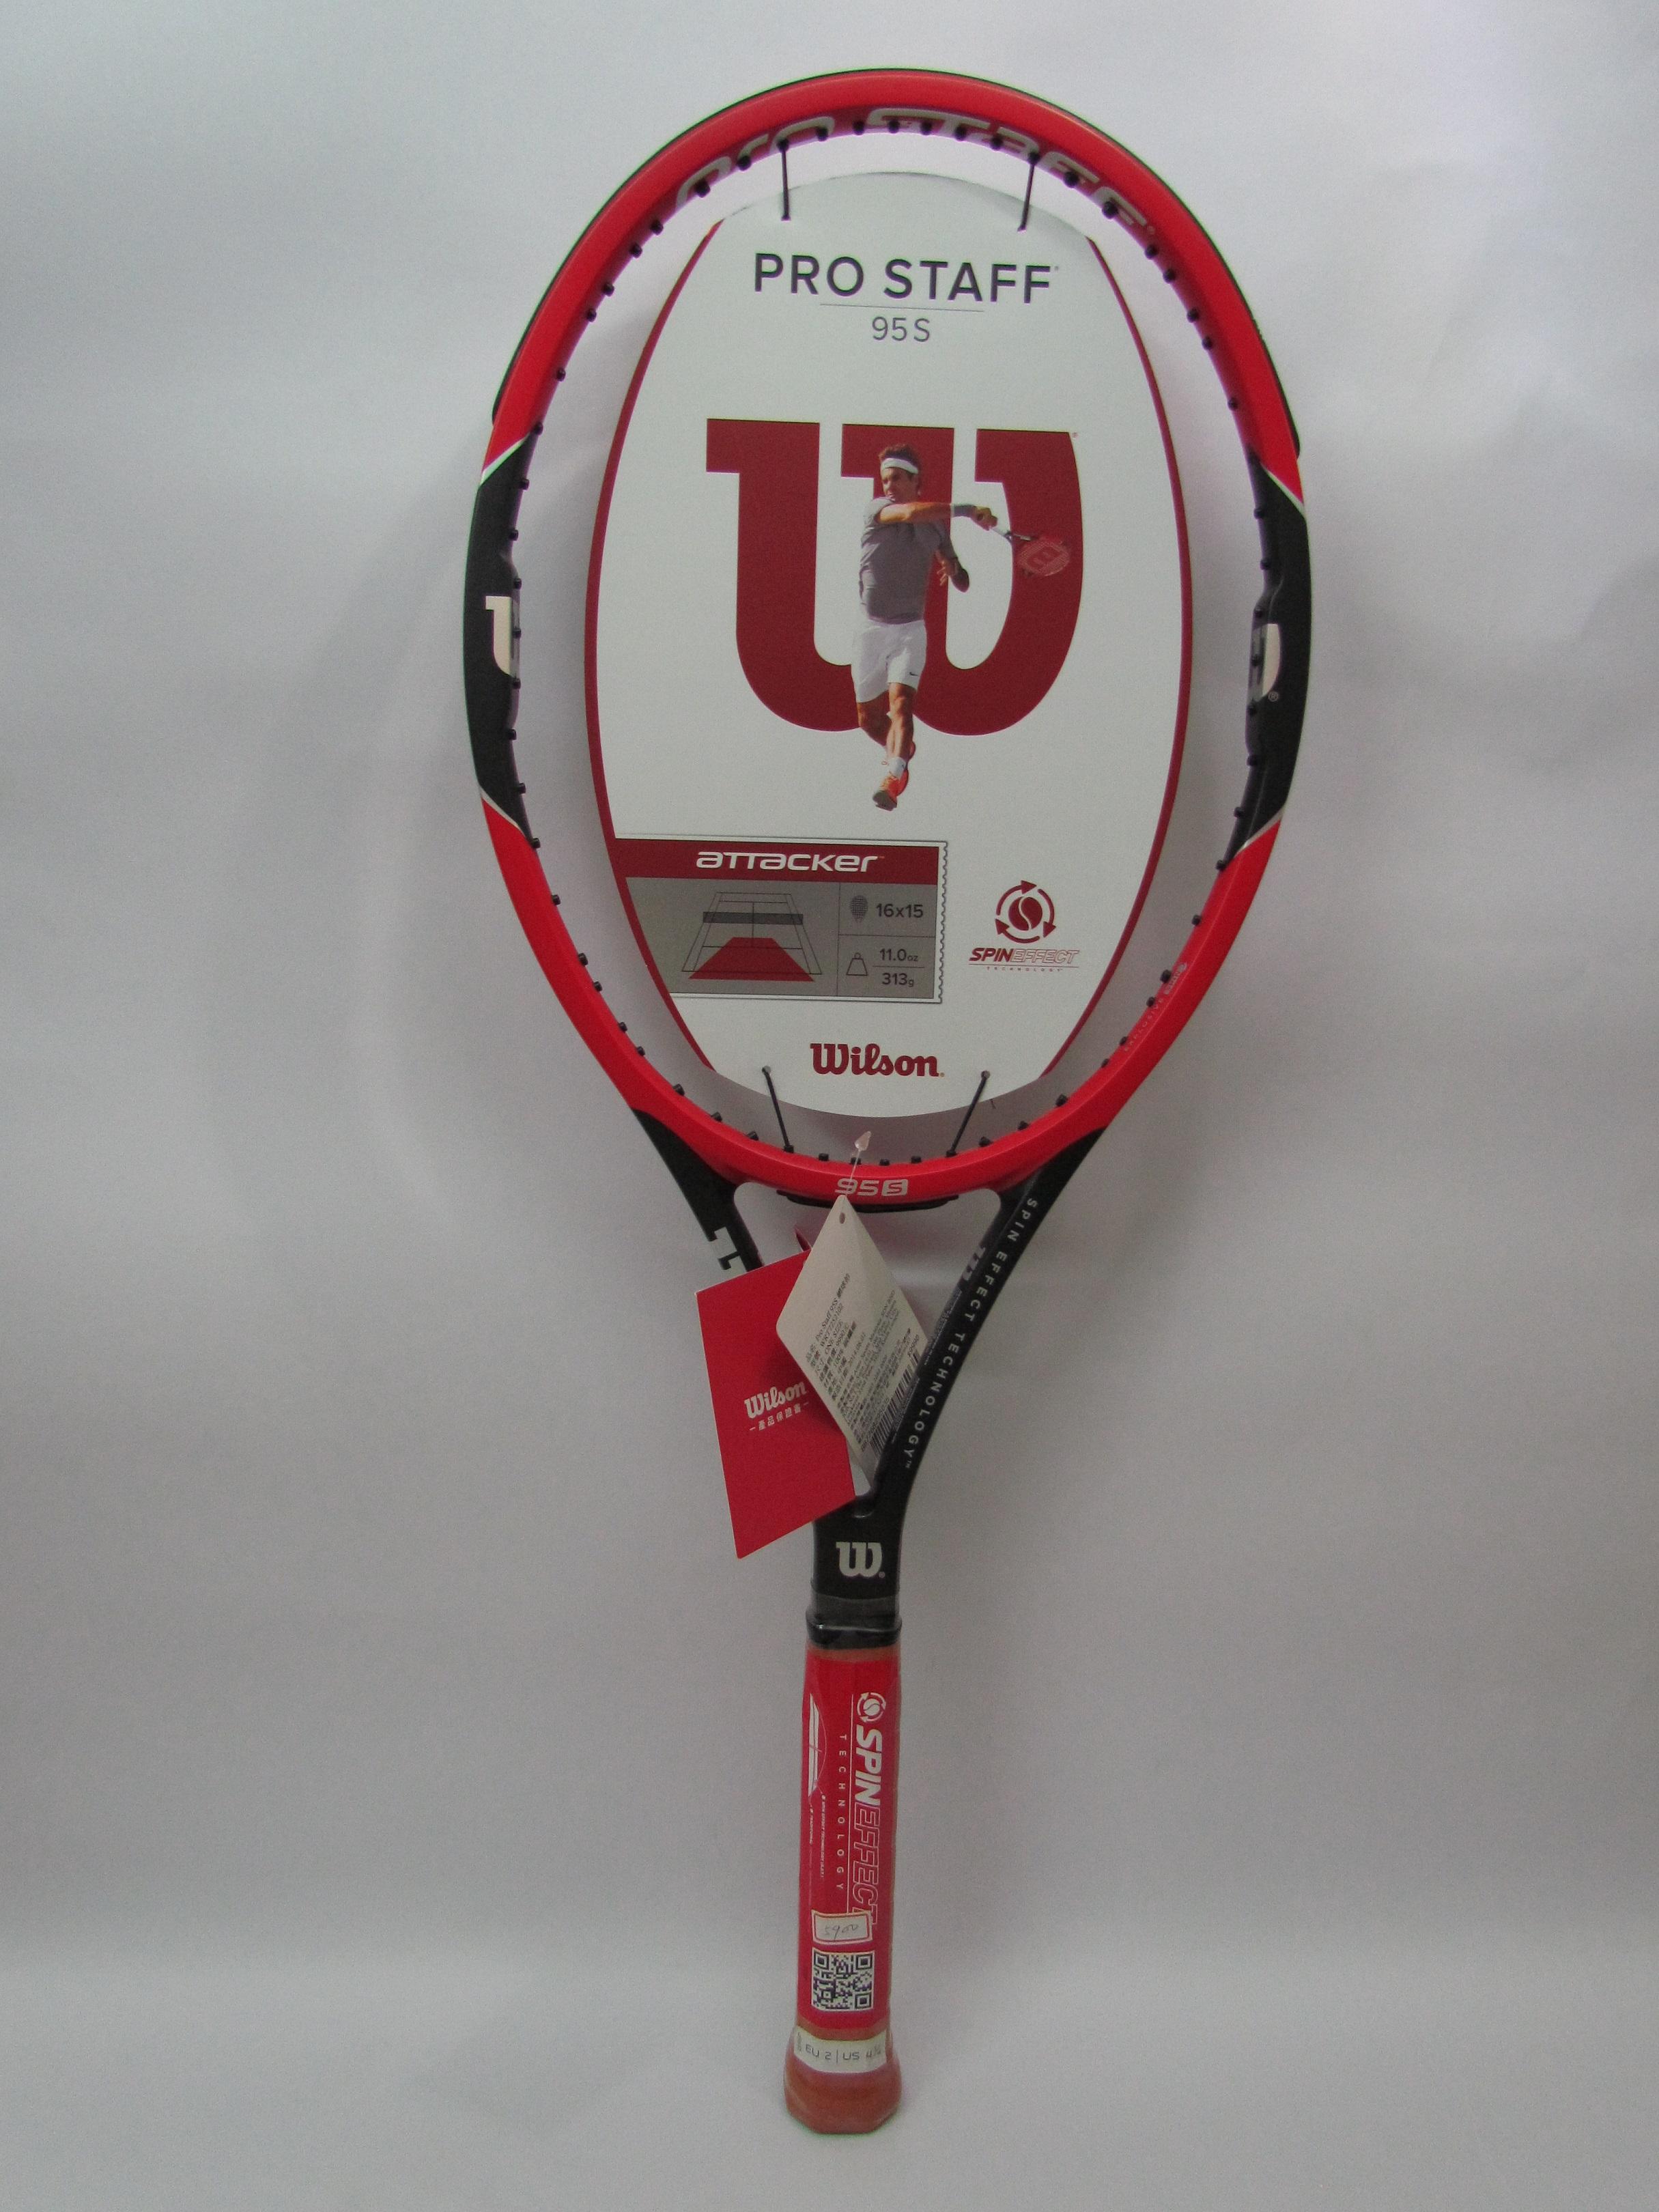 Wilson專業網球拍 Federer款 Pro Staff 95S 2015年款